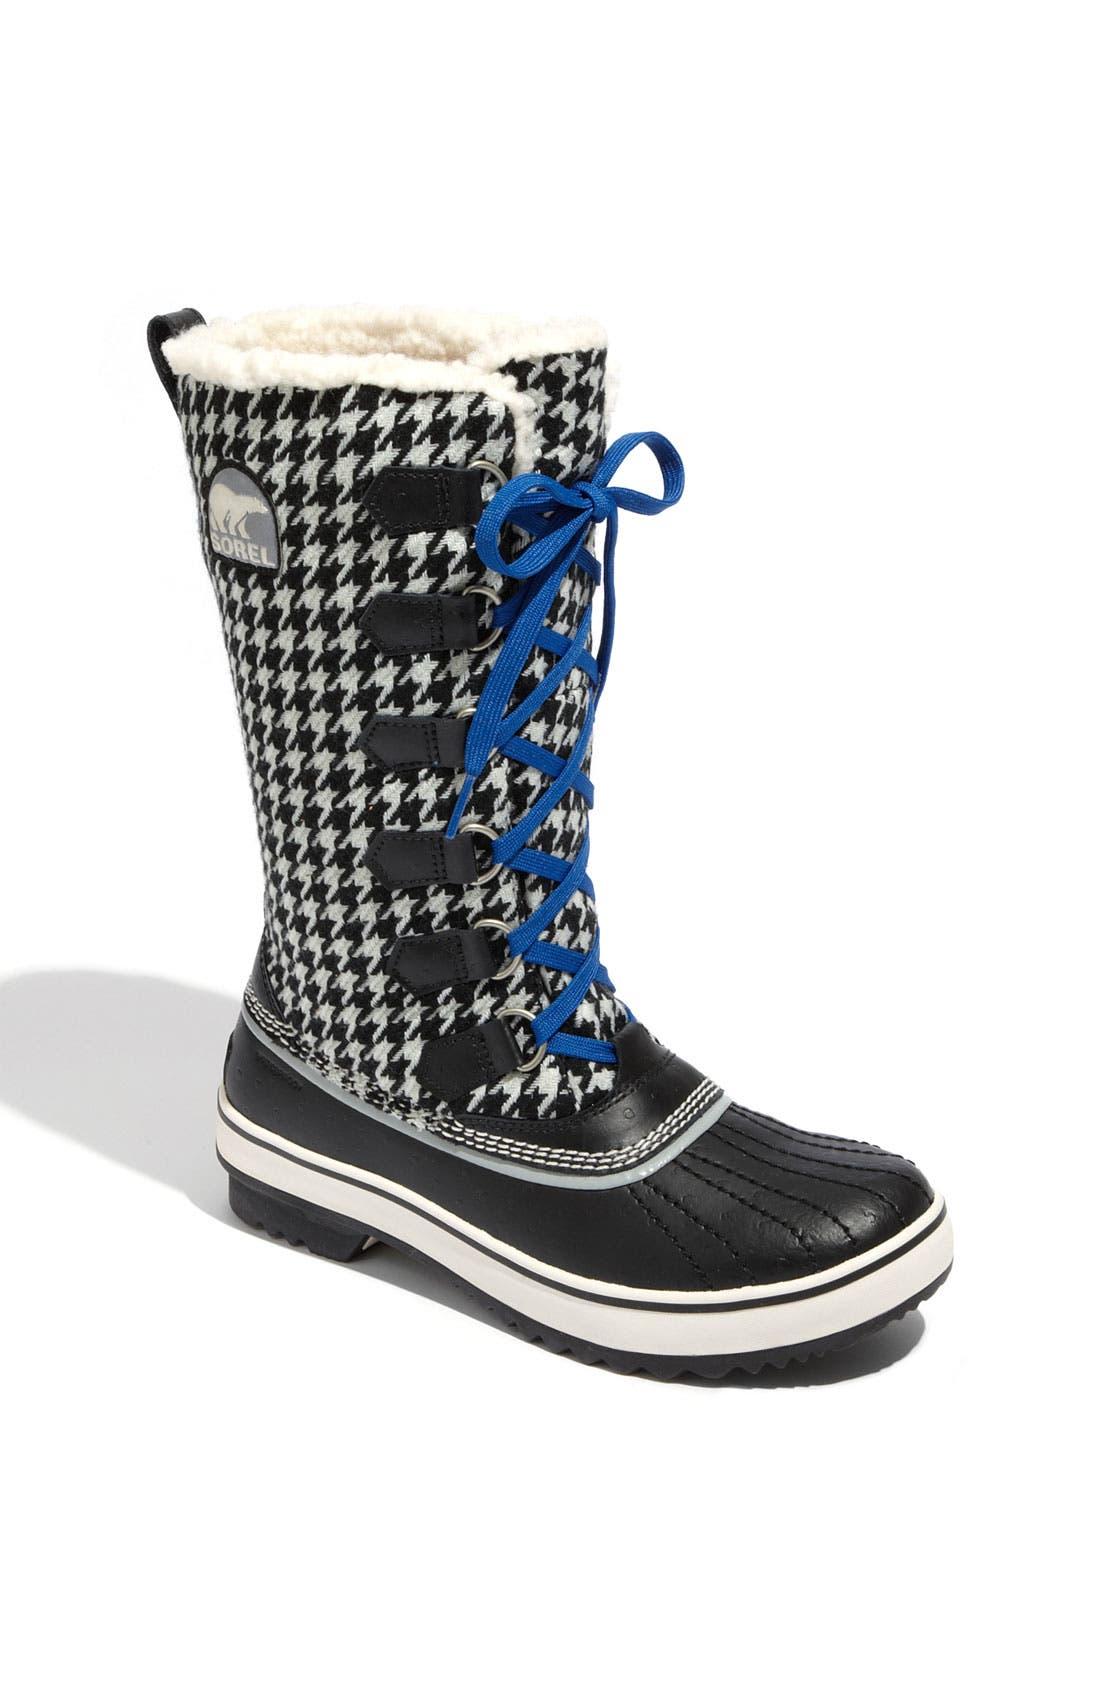 Alternate Image 1 Selected - SOREL 'Tivoli High' Waterproof Boot